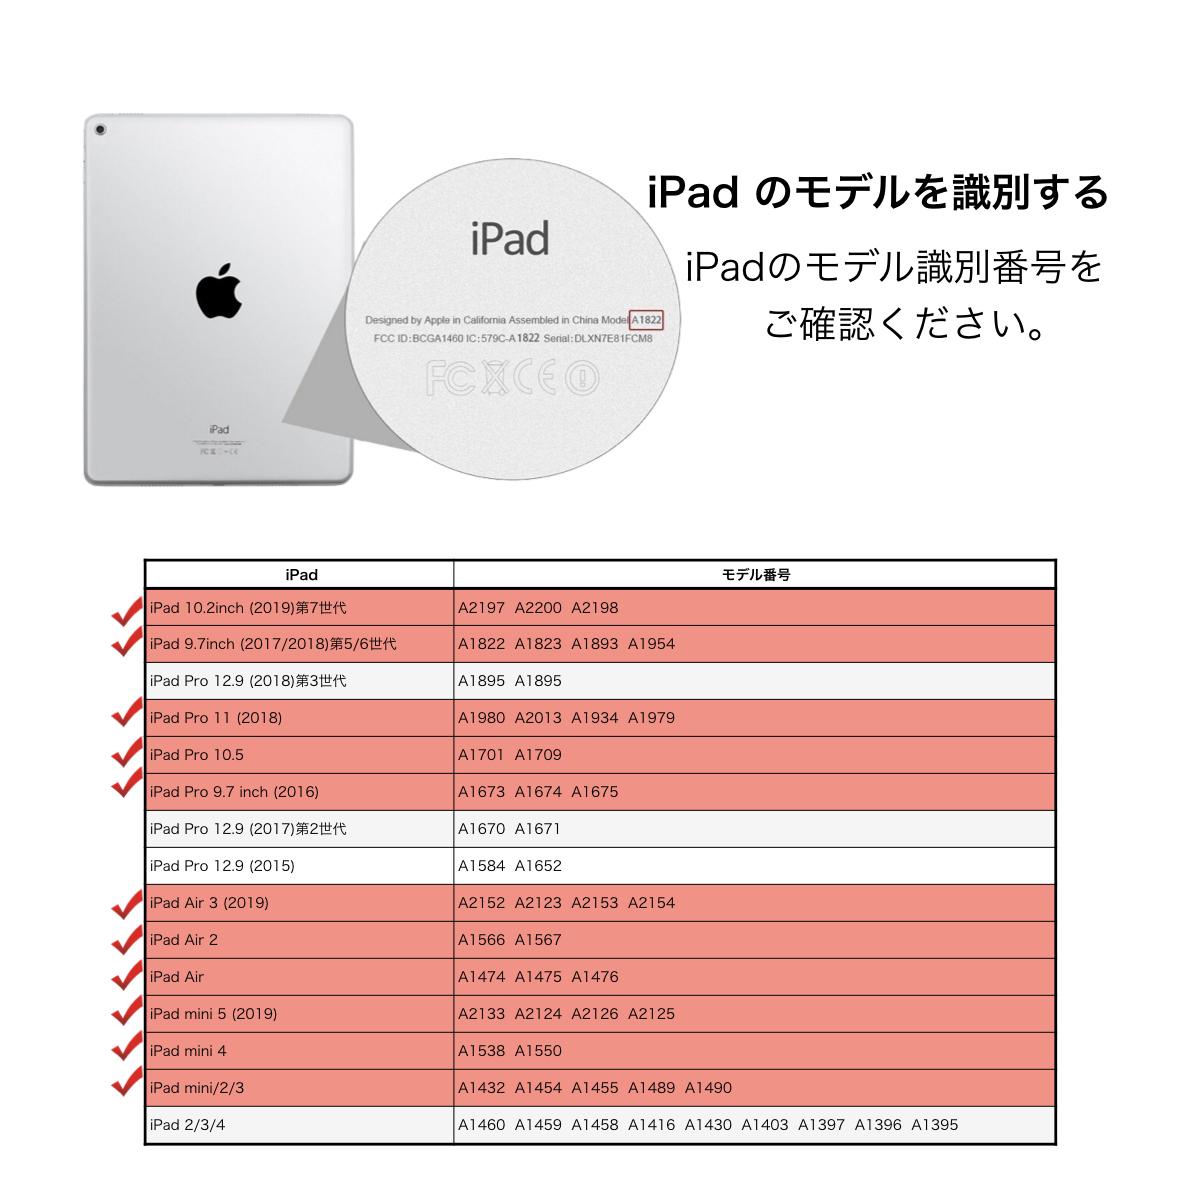 【AppleiPad用】【HUAWEIMediaPad用】360度回転ケース/カバー201910.2第7世代2018/2017iPad9.7iPadPro11/10.5iPadAir2/AiriPadmini4/3/2HUAWEIMediaPadm5ケースM3Lite10WP/dtabd-01KM3Lite10M3Lite8.0インチM38.4インチ/dtabd-01J